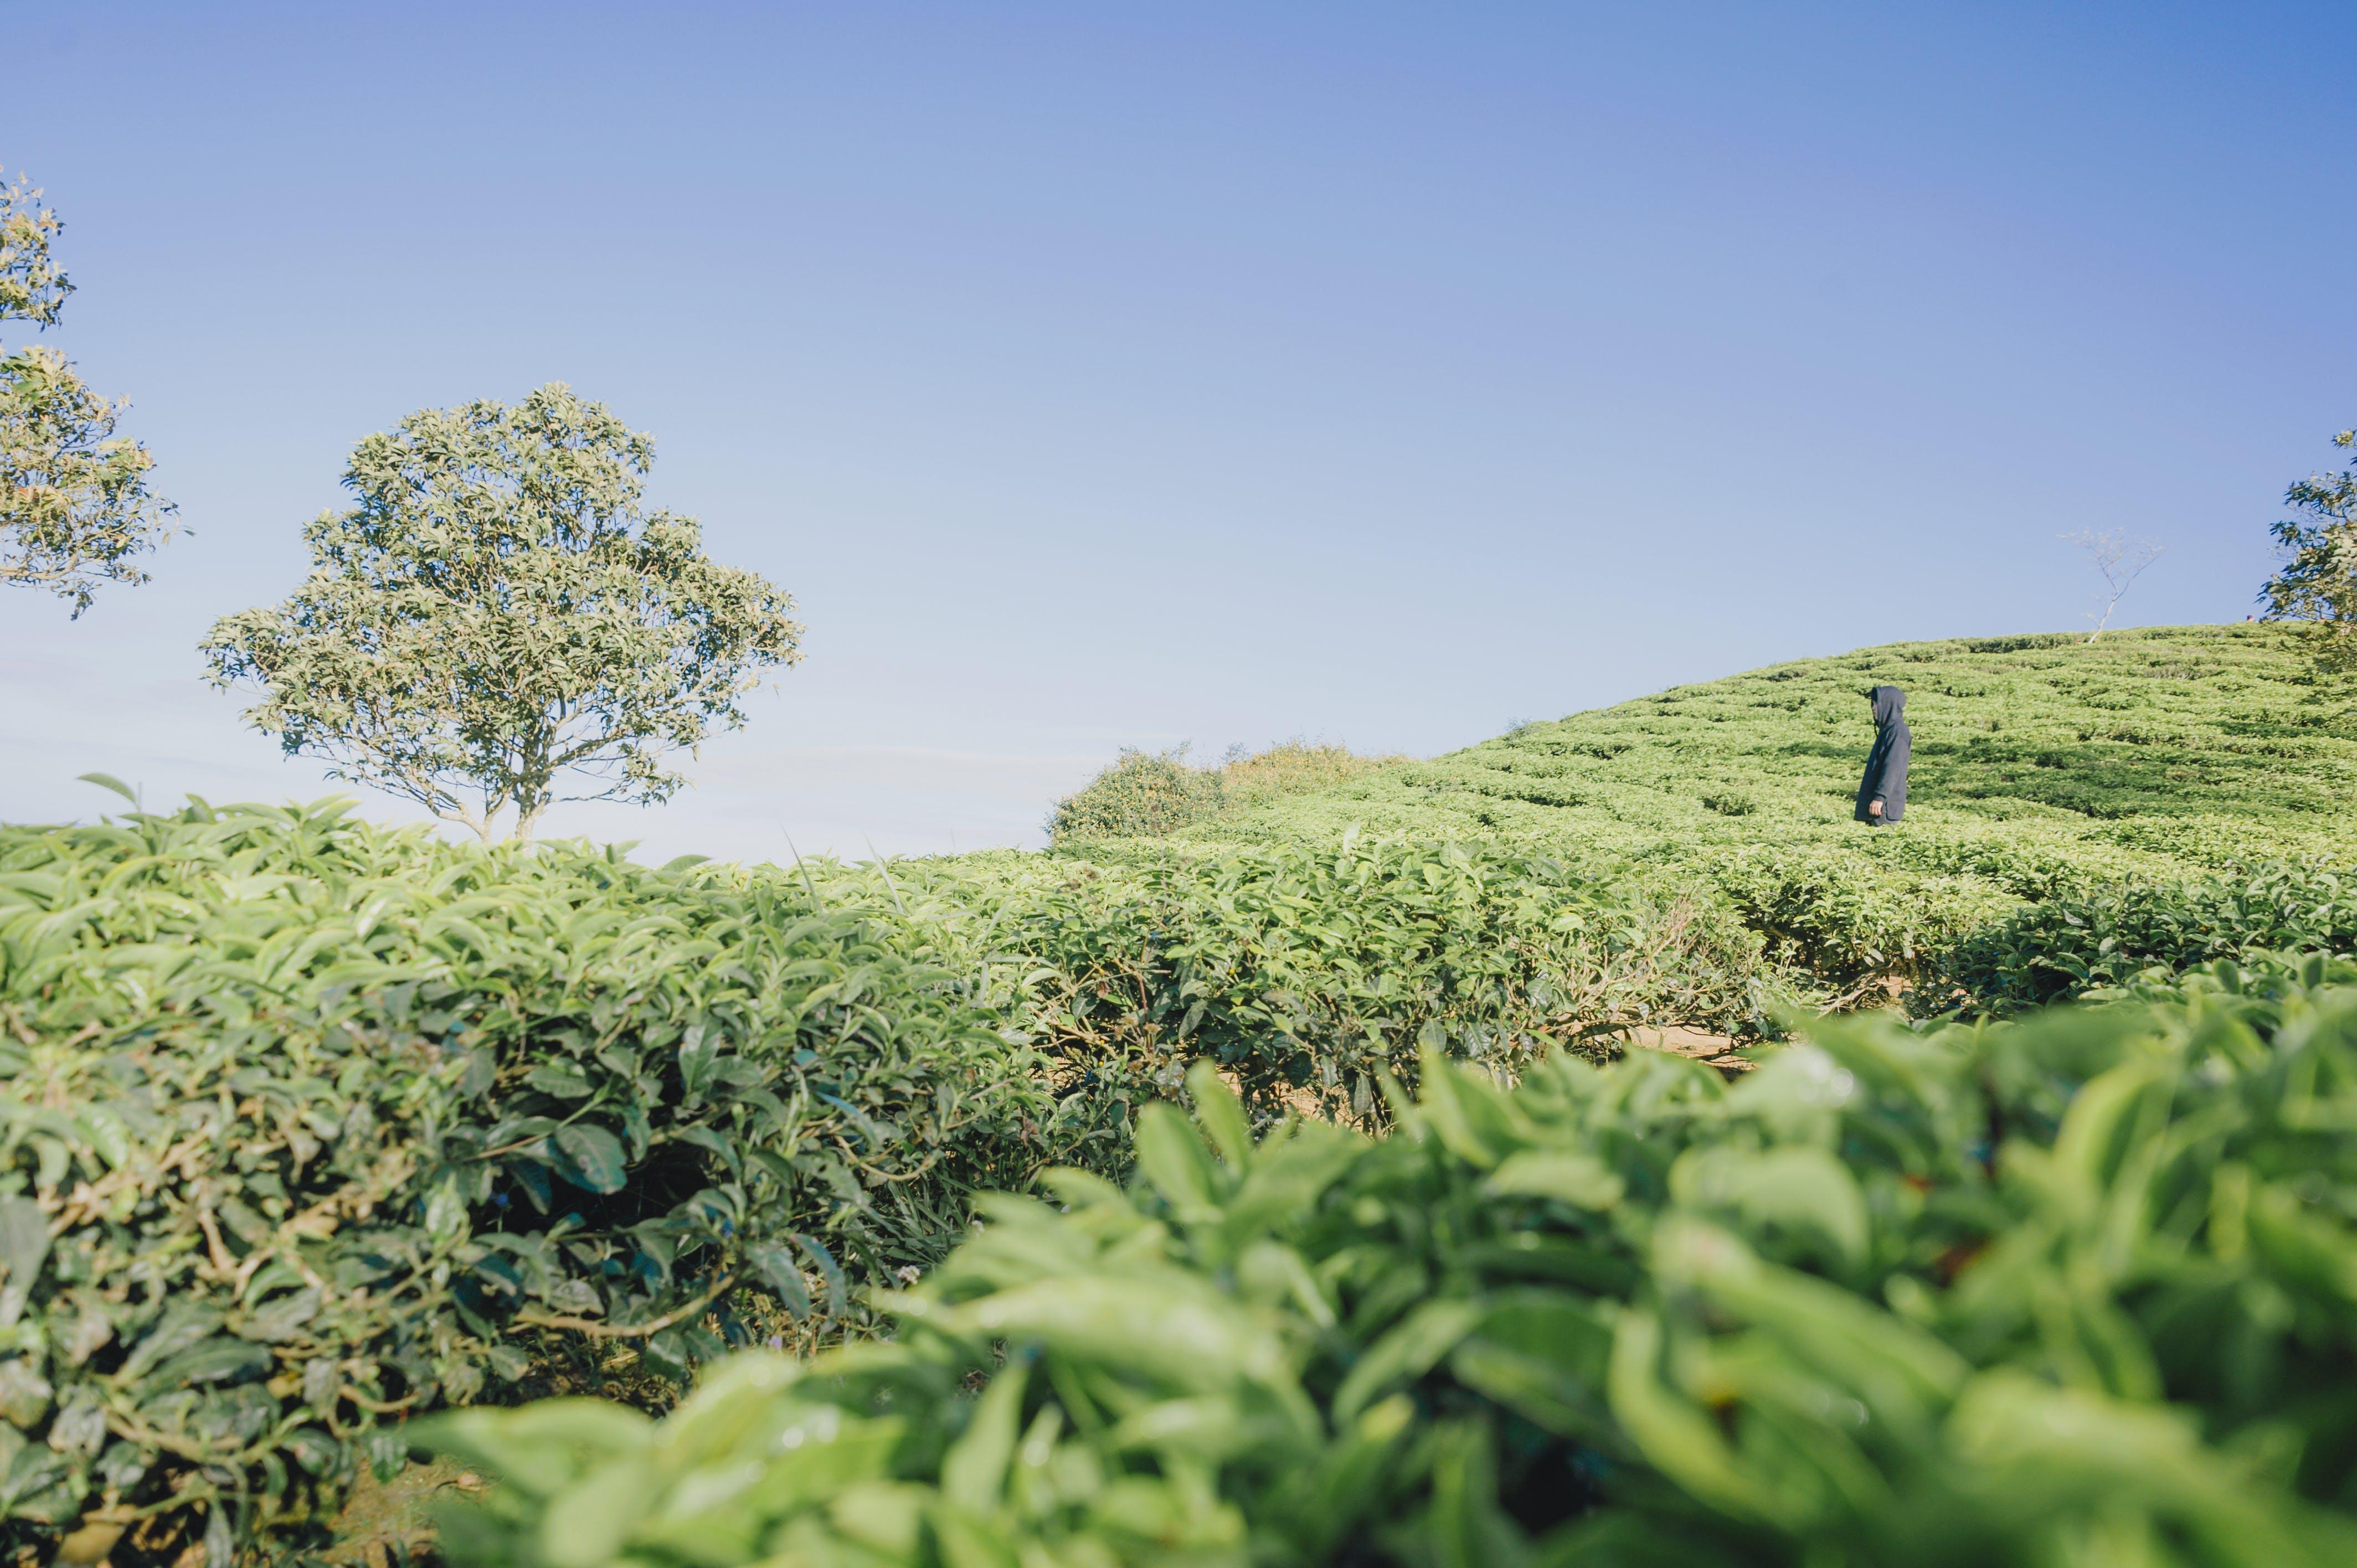 Green Plants Covered Terrain